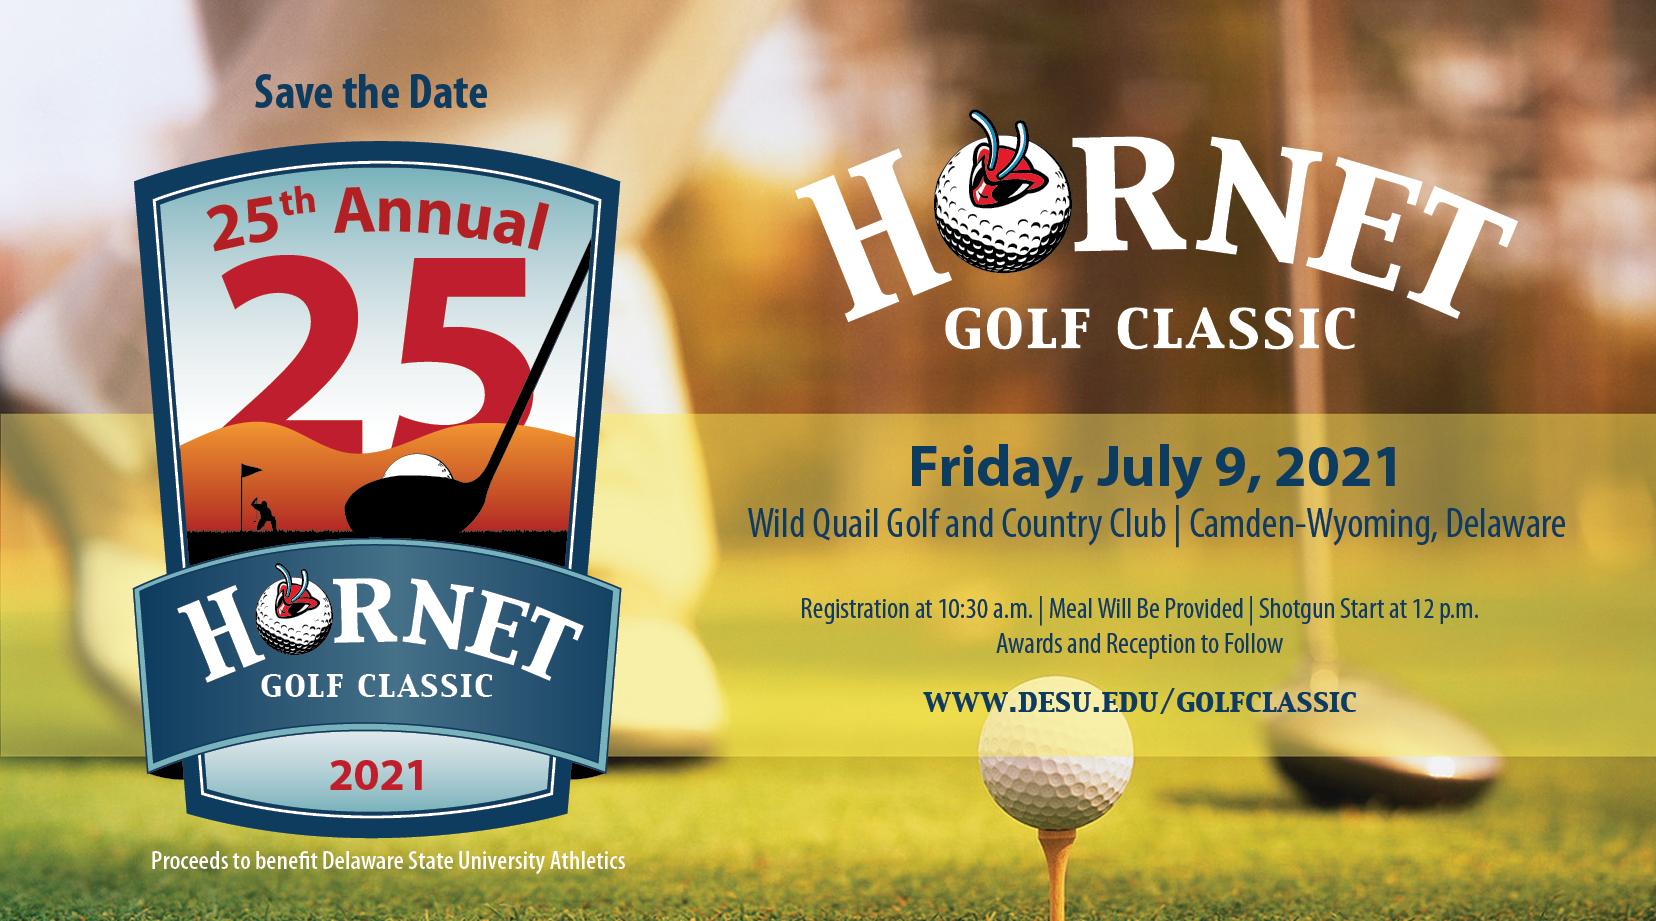 Hornet Golf Classic 2021